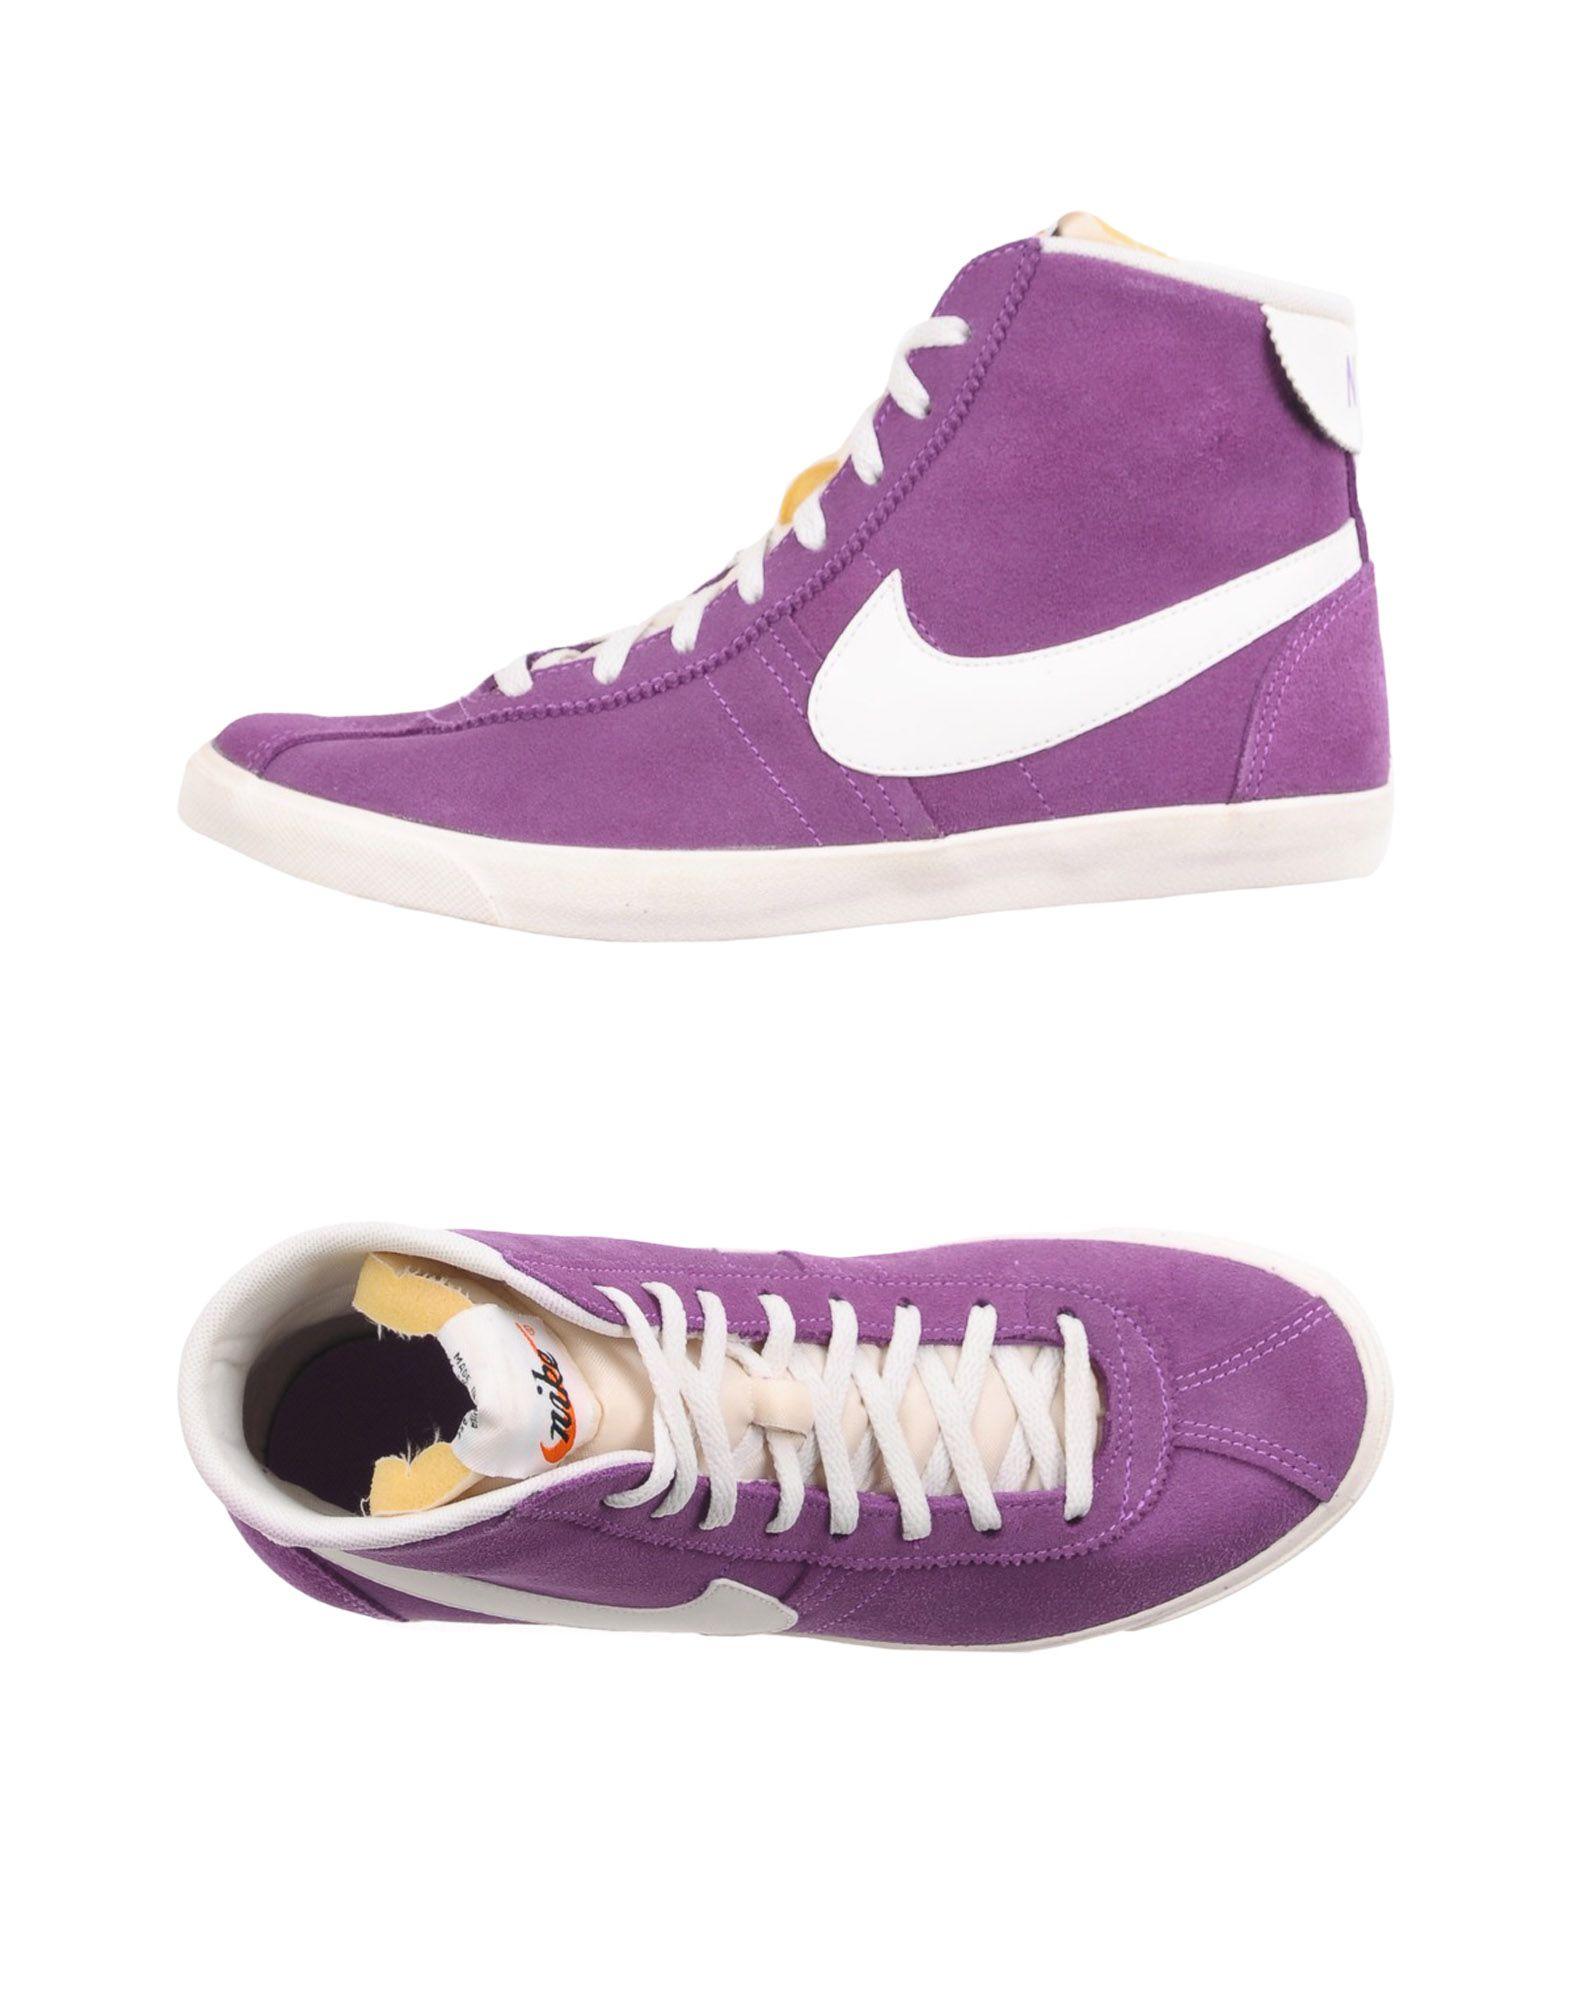 A buon mercato Sneakers Nike Donna - 11242389KN